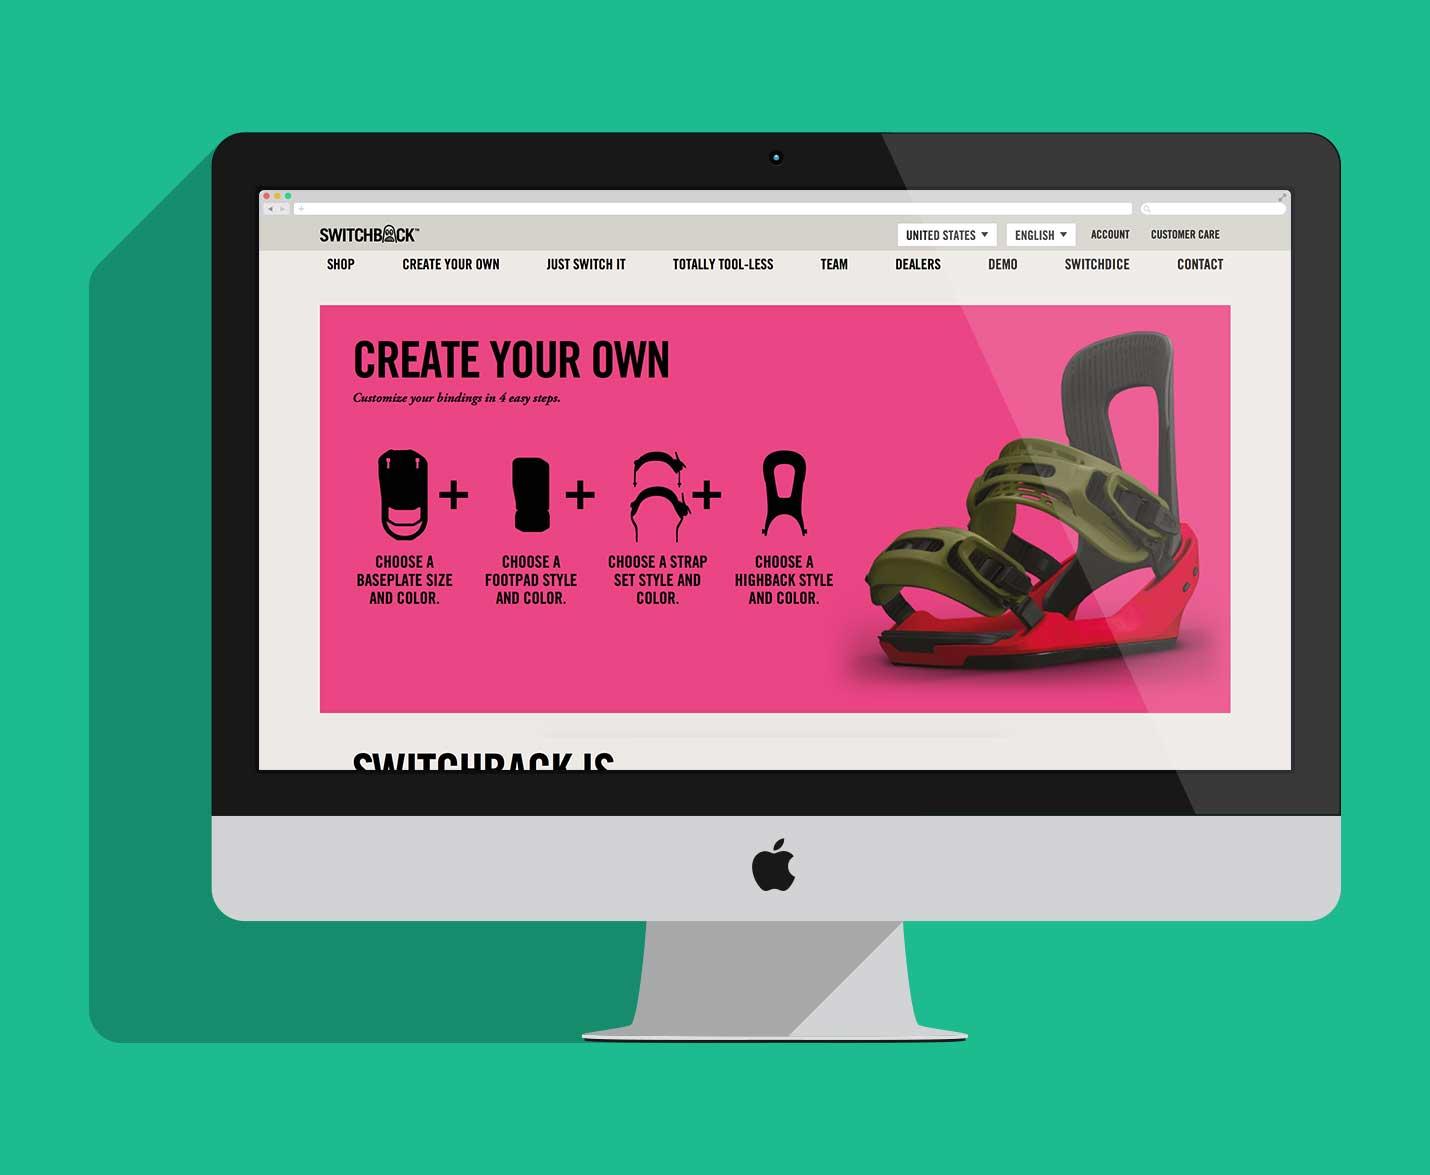 switchback-homepage